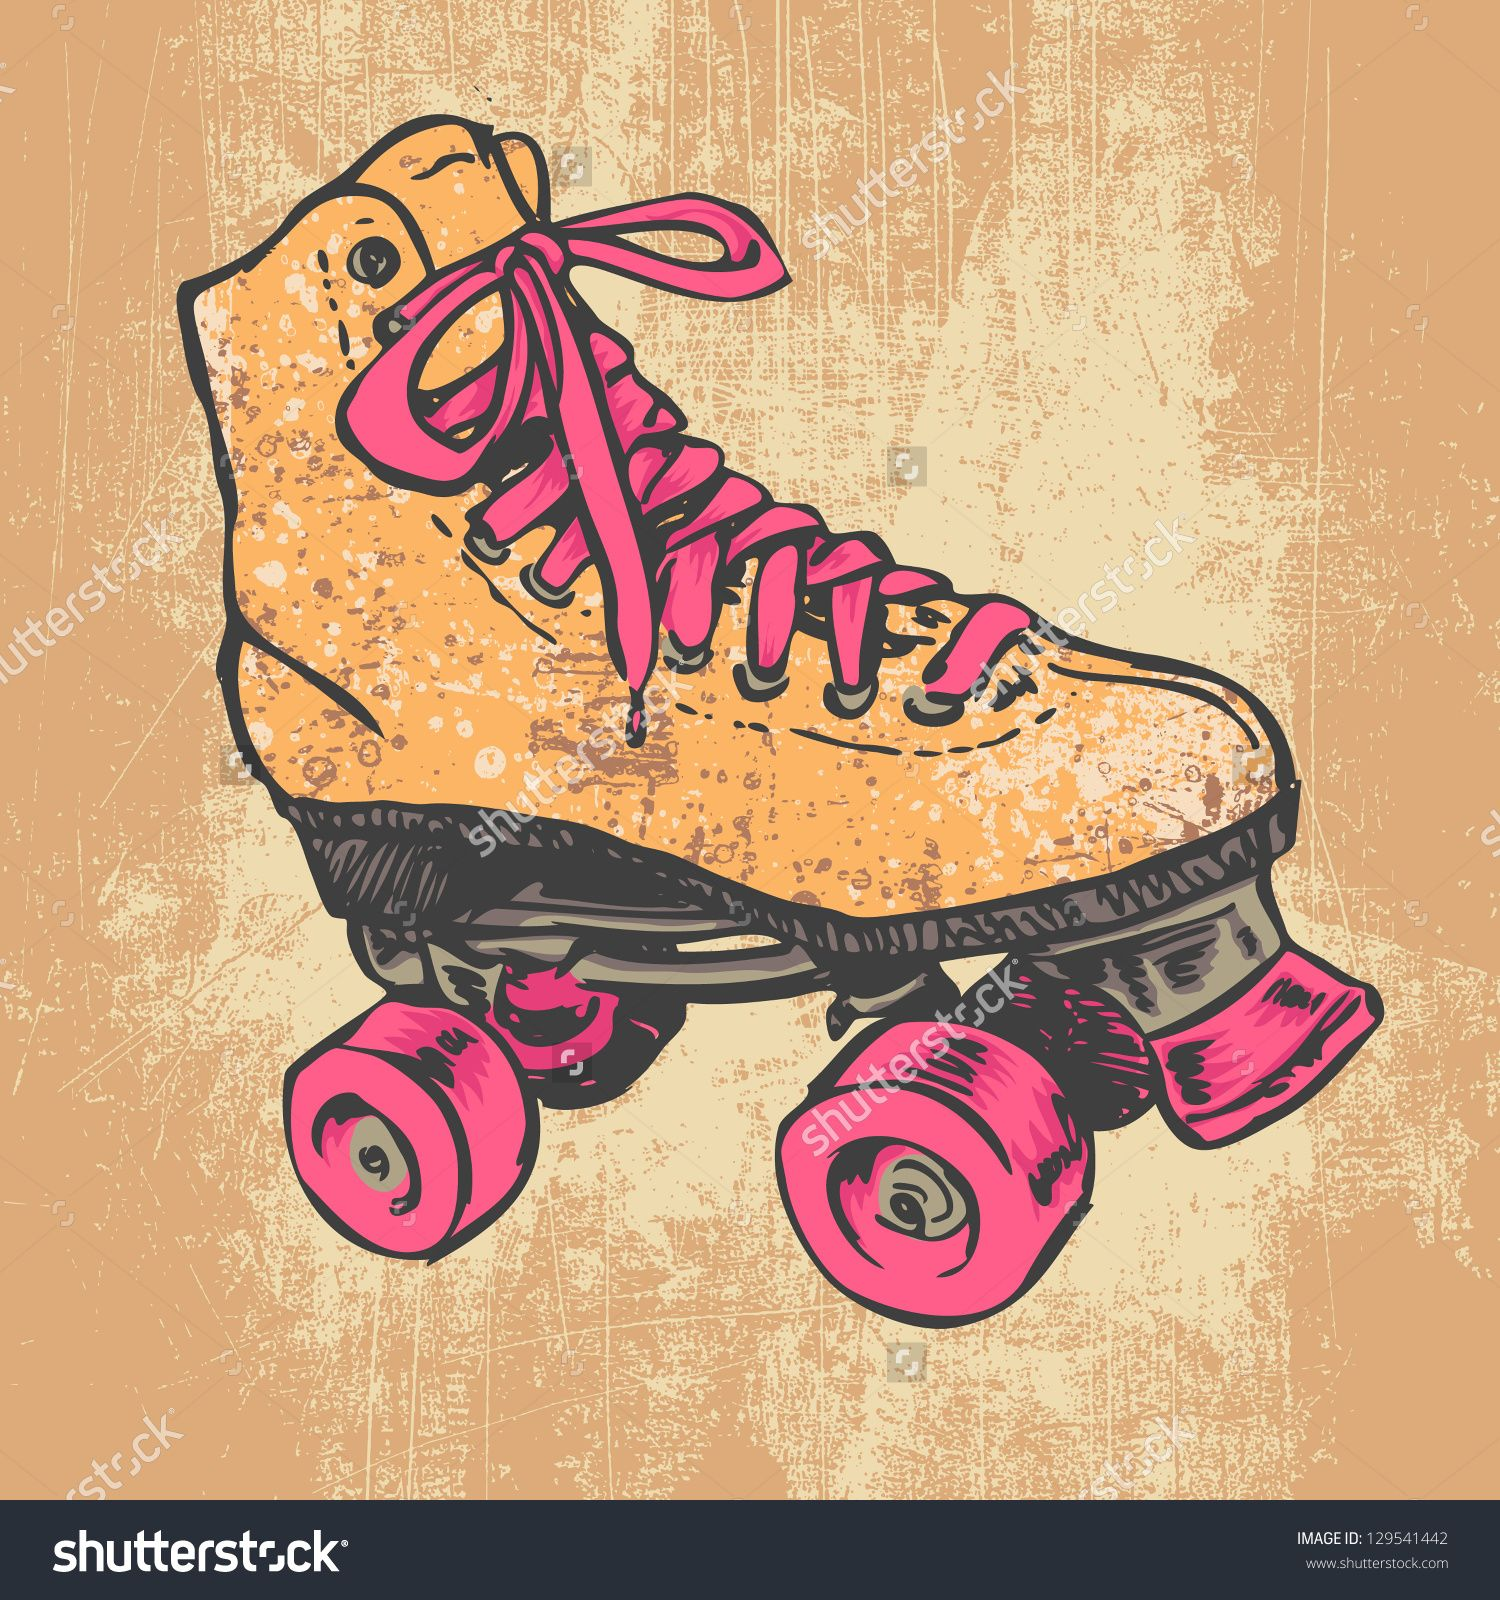 Retro Roller Skate And Grunge Texture Background Vector Illustration Retro Roller Skates Roller Derby Art Roller Skating